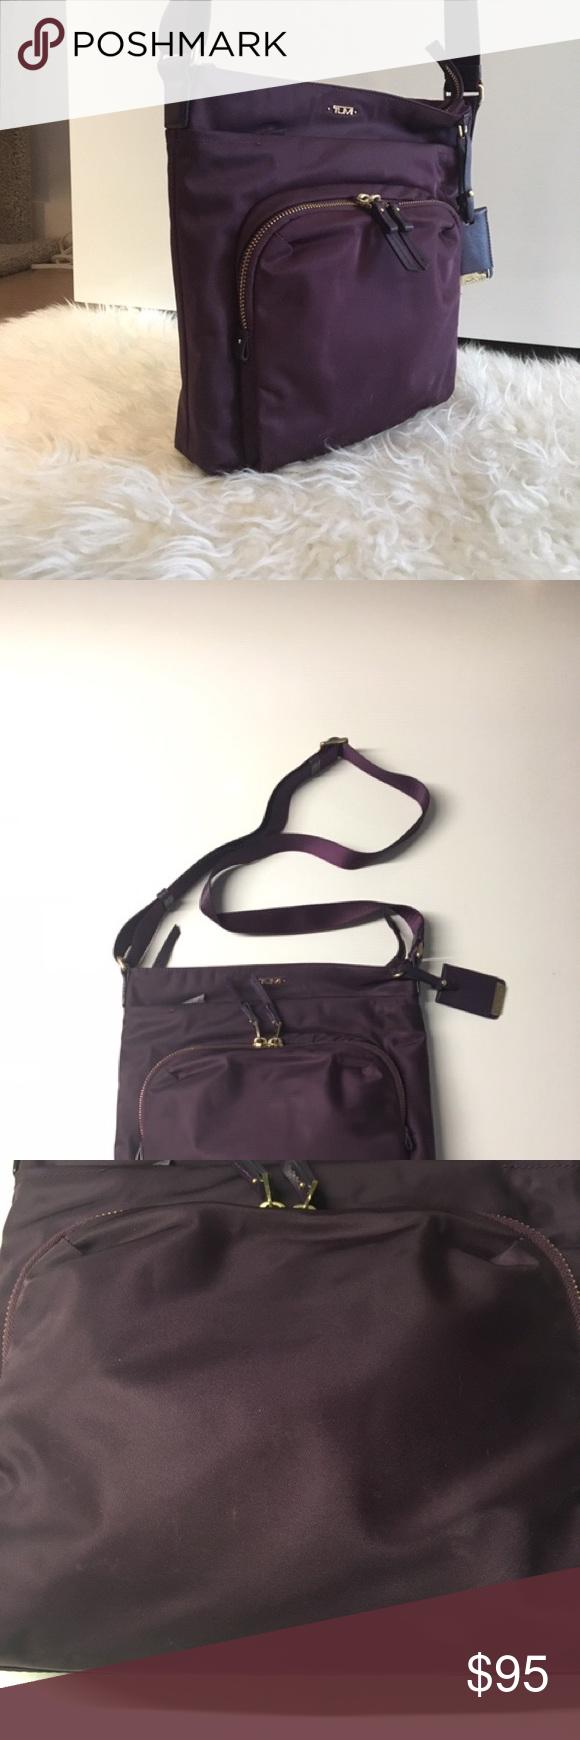 a7851108545a TUMI Voyager - Capri Nylon Crossbody Bag Violet Genuine TUMI cross body in  a gorgeous deep